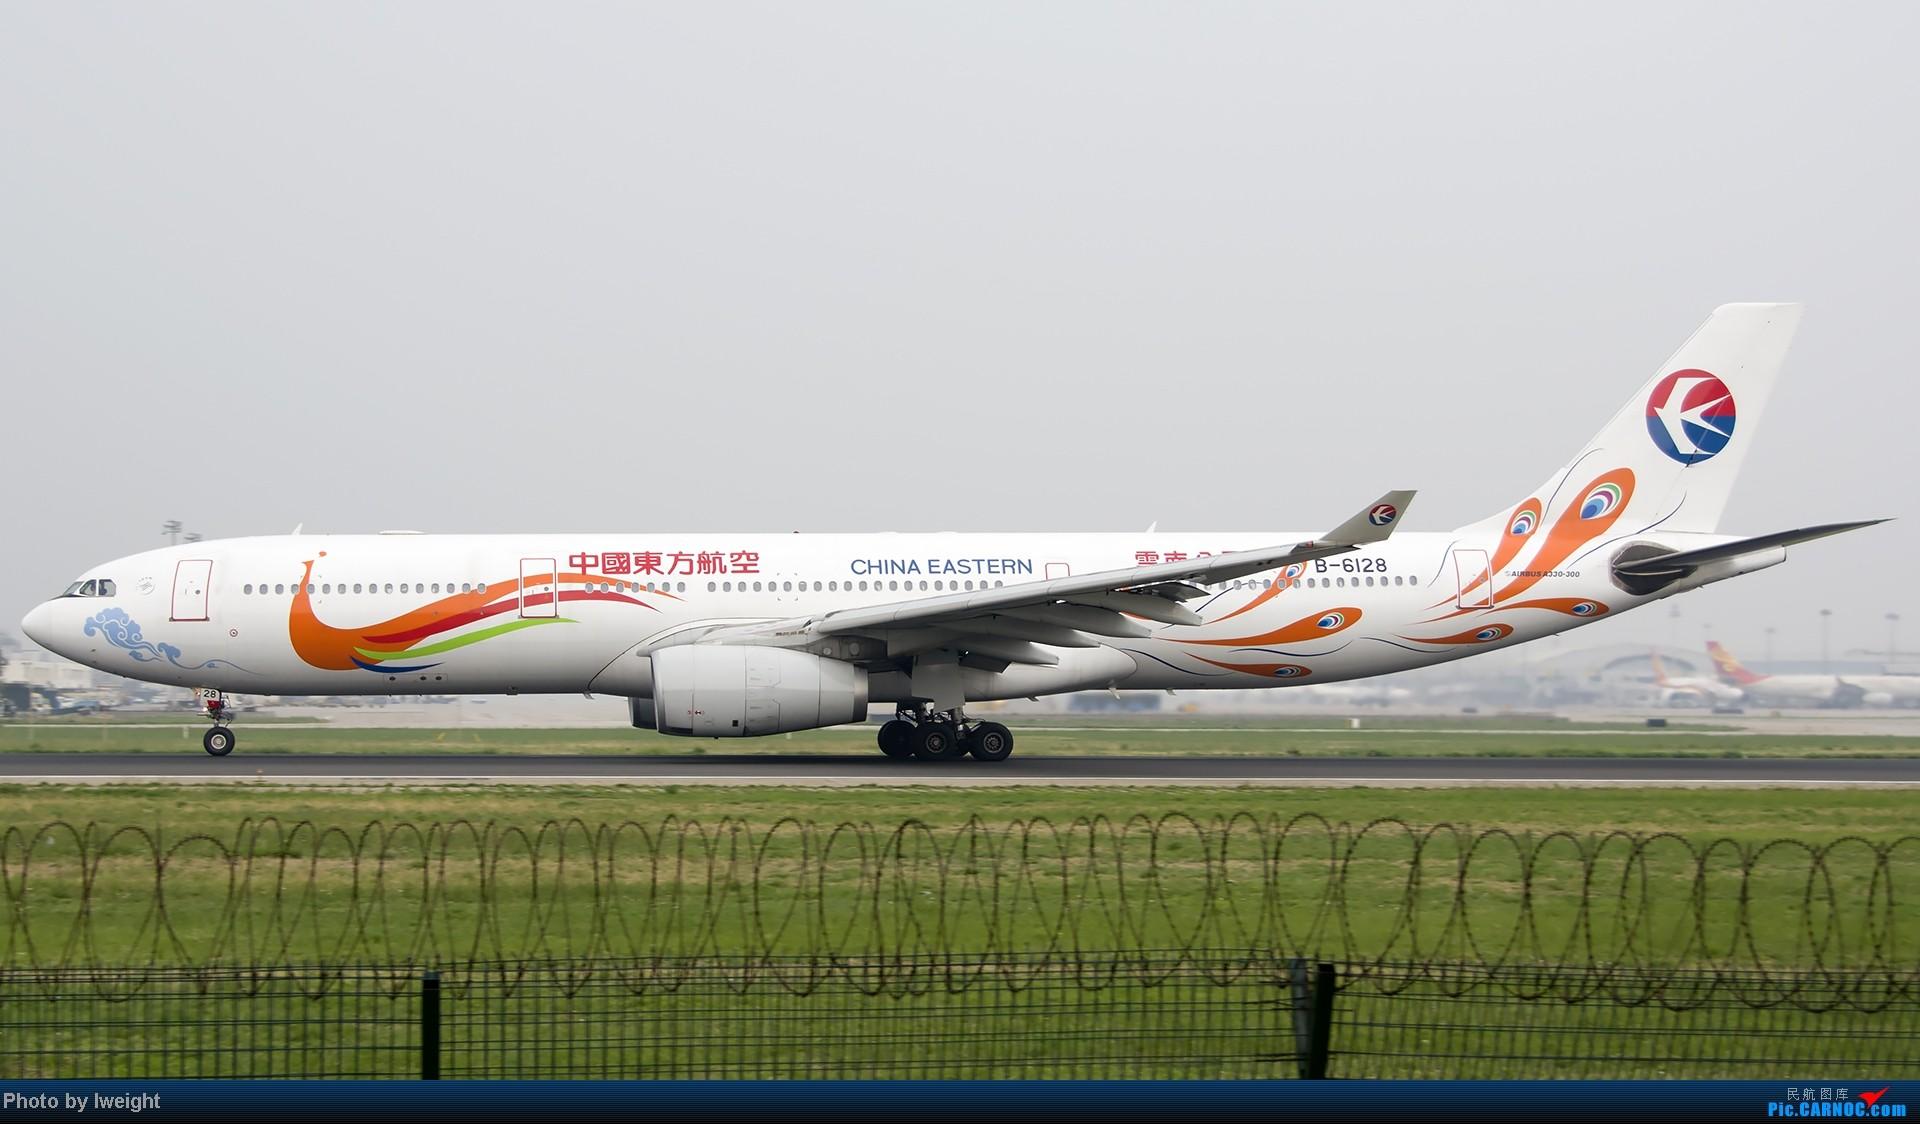 Re:[原创]休假无聊,跑道边来拍机玩(晚点的ZestAir、换装的B6100和刚交付的B2738等) AIRBUS A330-300 B-6128 中国北京首都机场